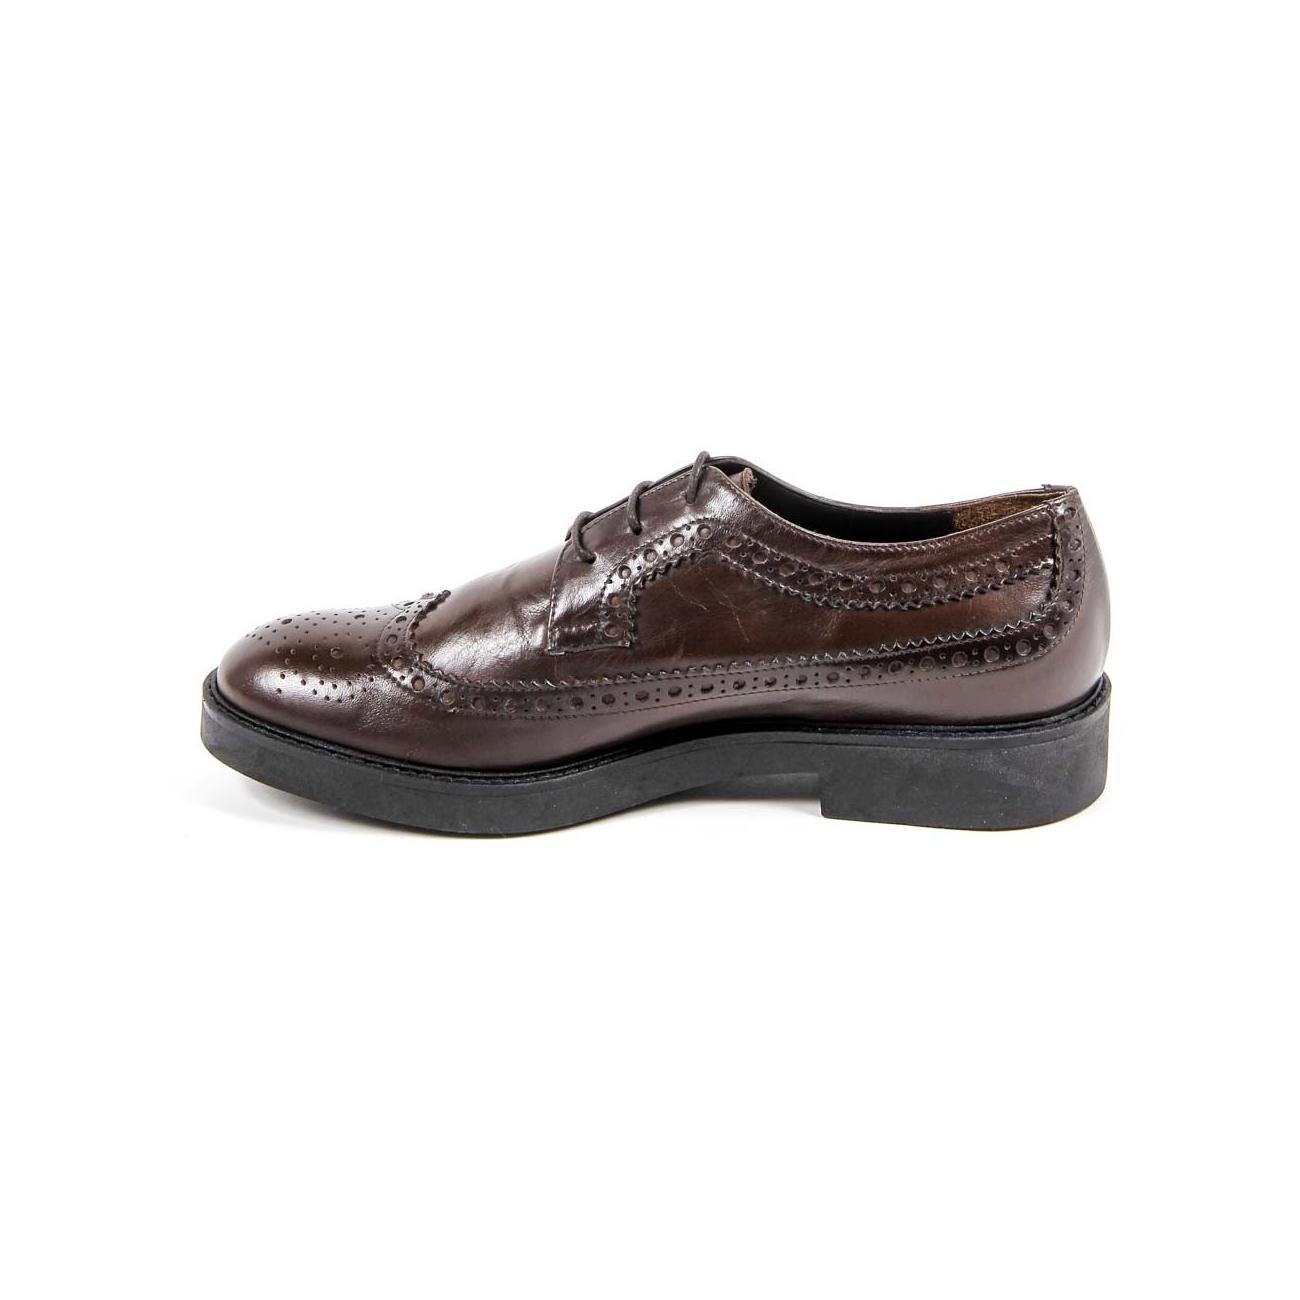 V 1969 Italia Women's Brogue Shoe B1670 VITELLO T. MORO COCCO